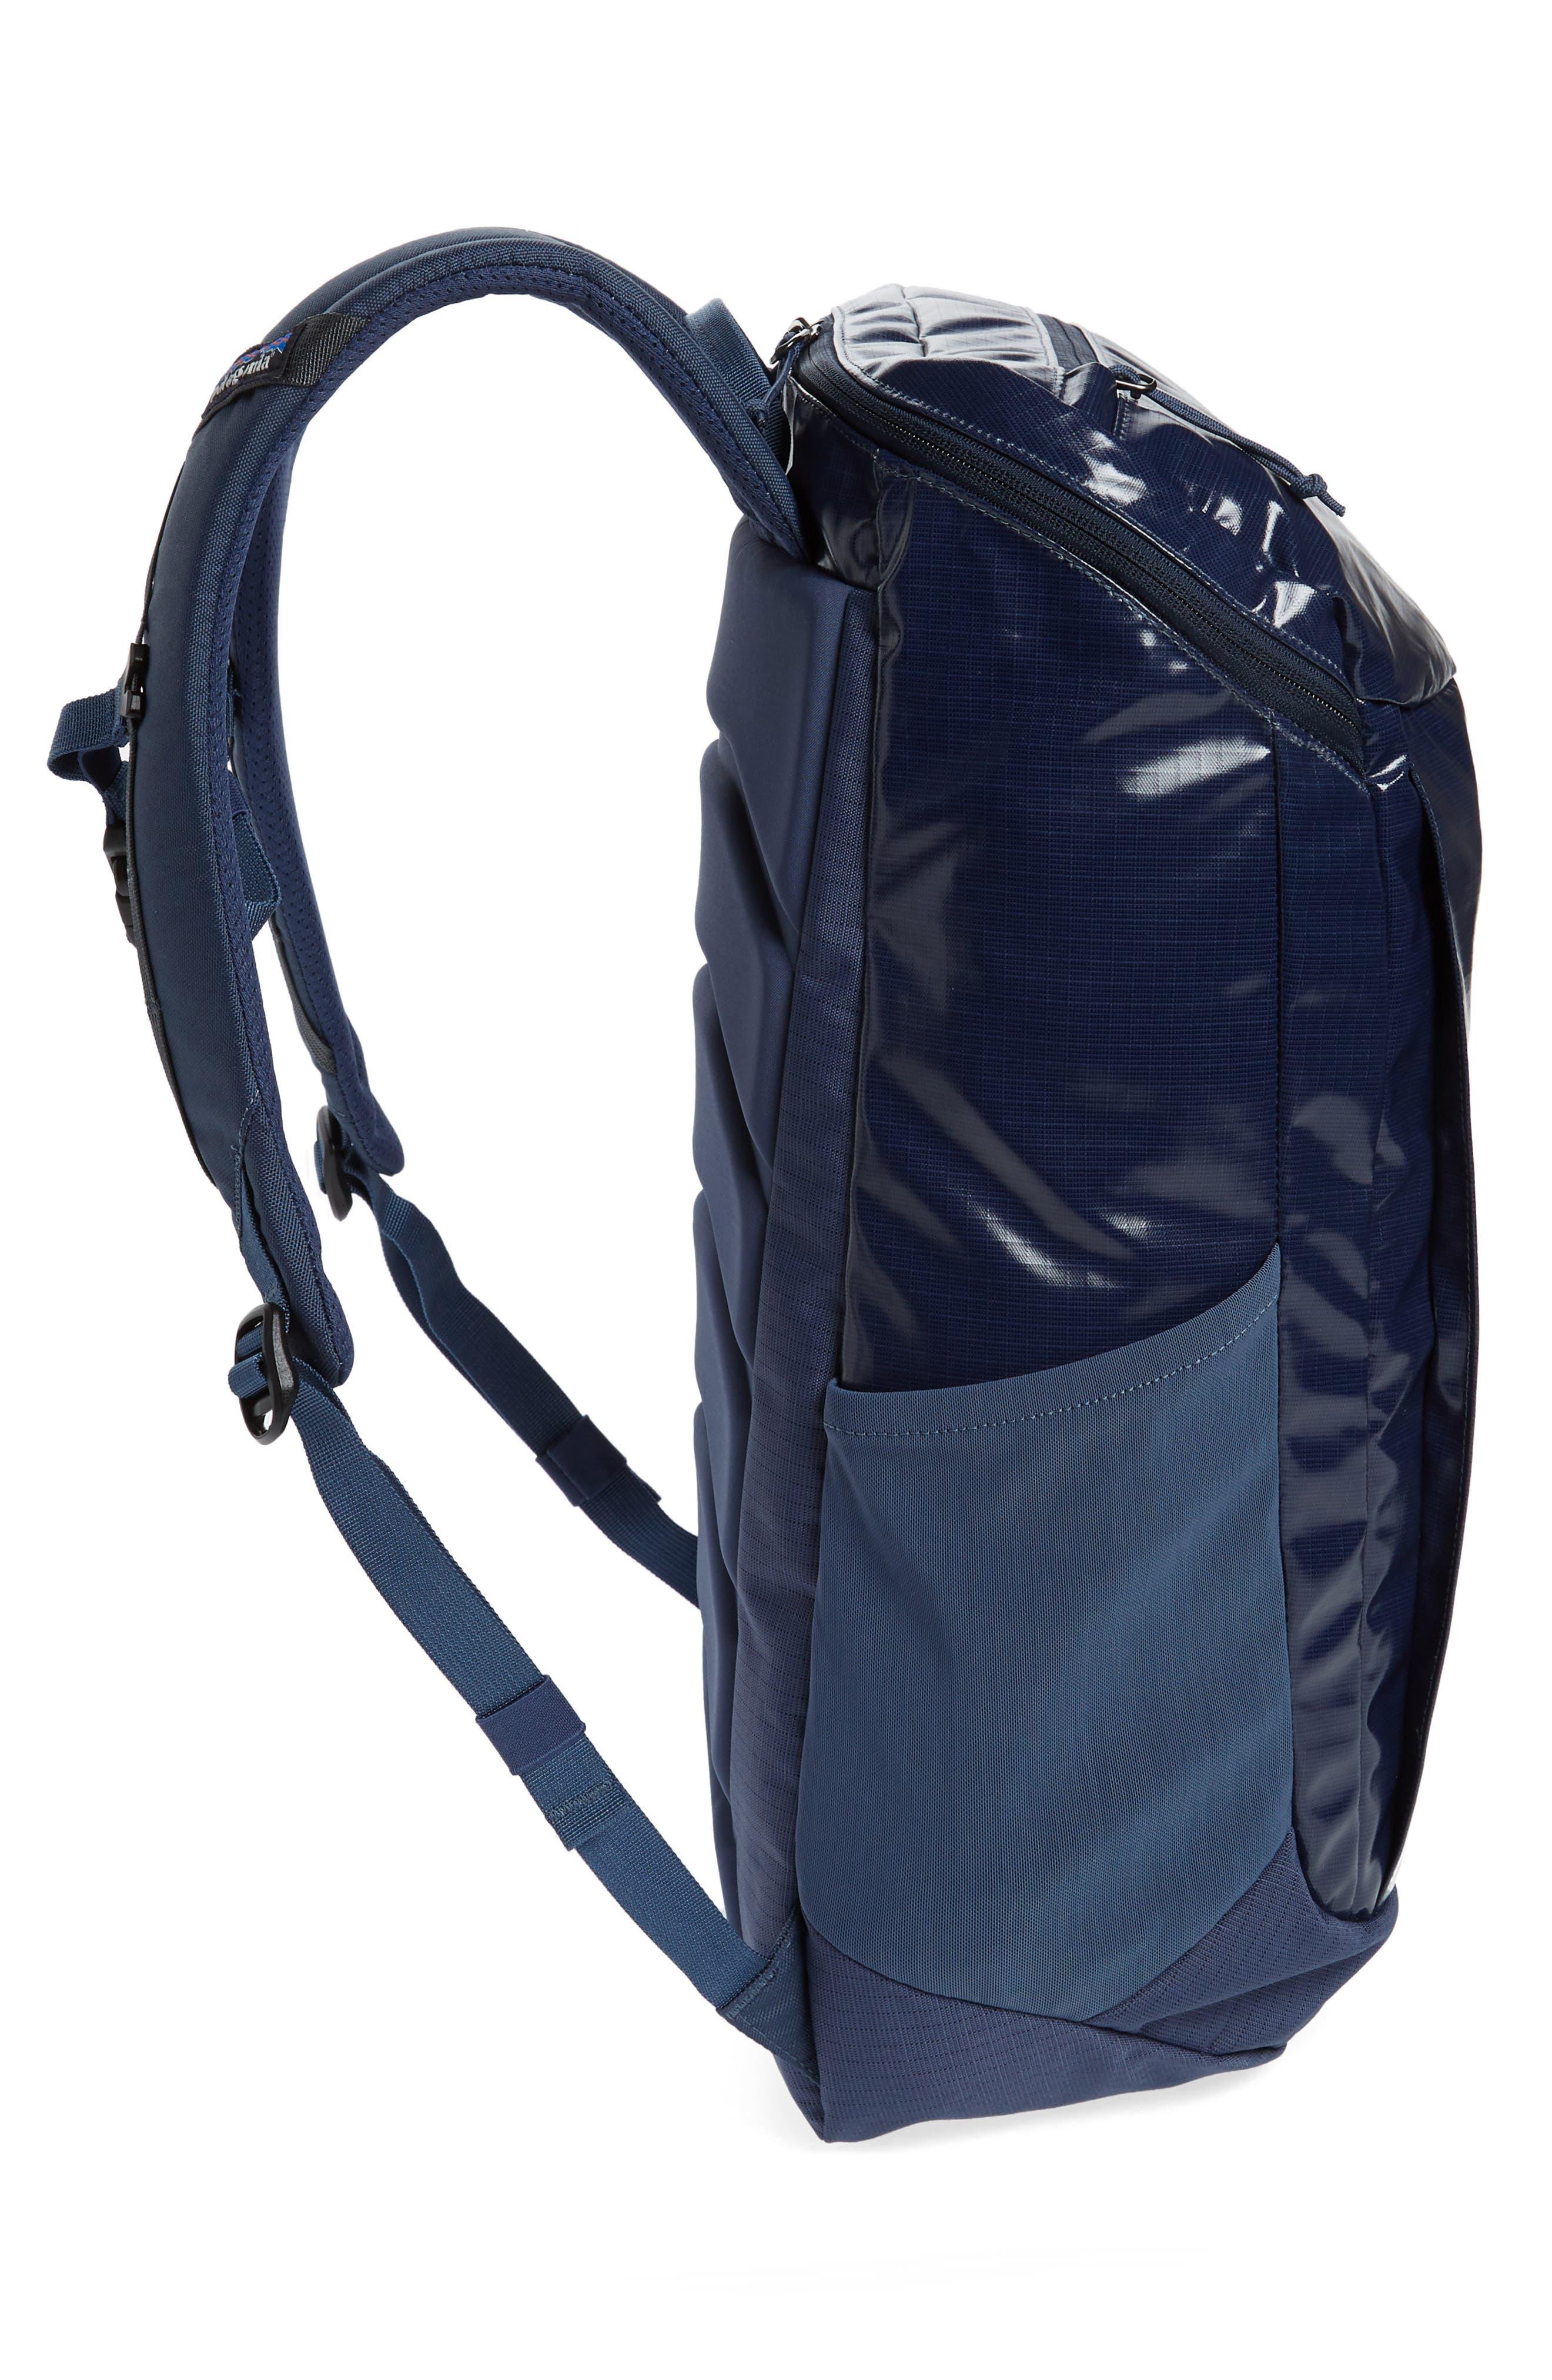 Black Hole 25 Liter Backpack,                             Alternate thumbnail 5, color,                             DOLOMITE BLUE